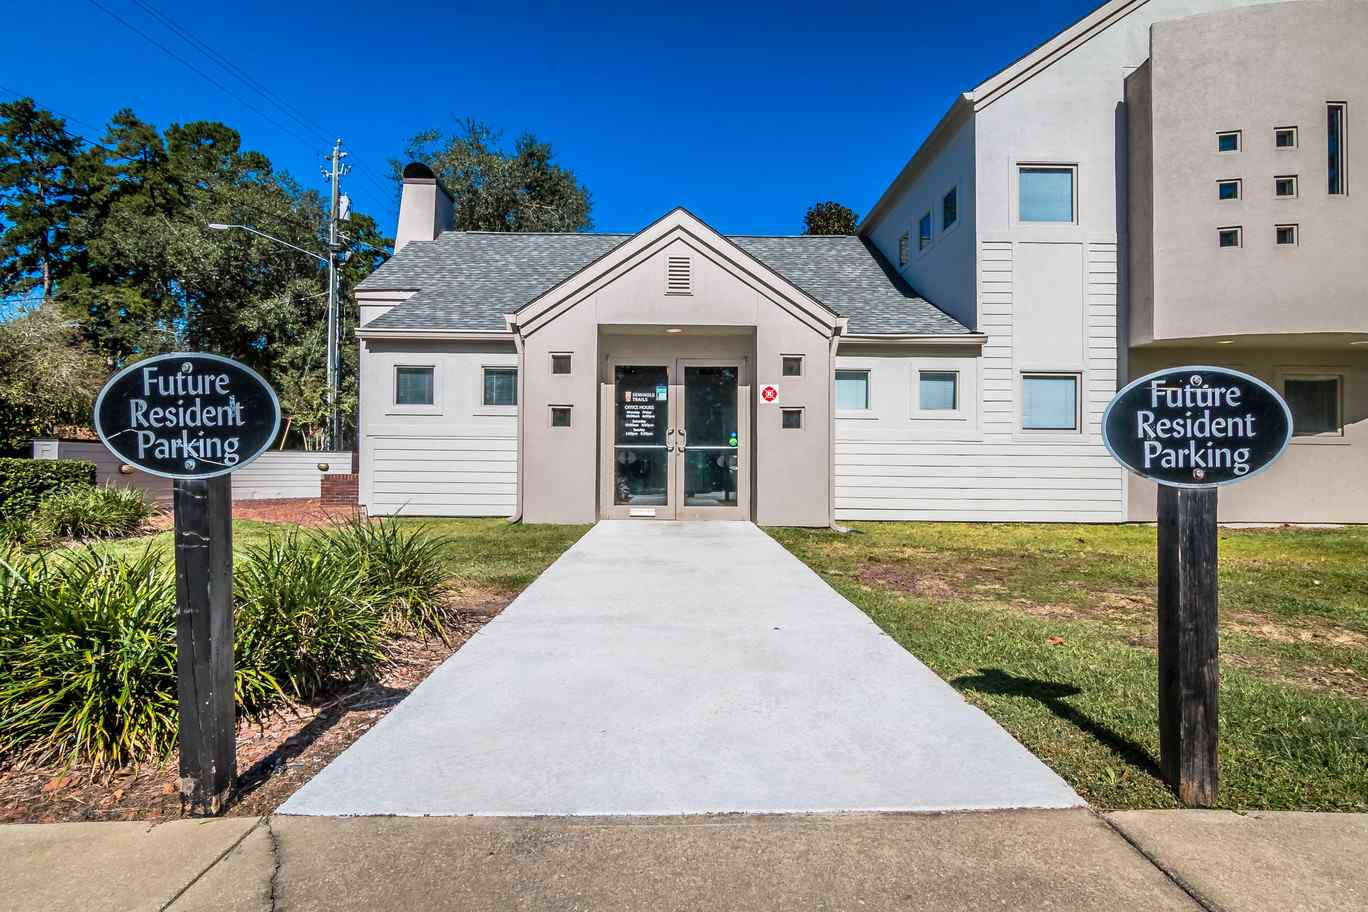 Seminole-Trails-Tallahassee-Exterior-Unilodgers